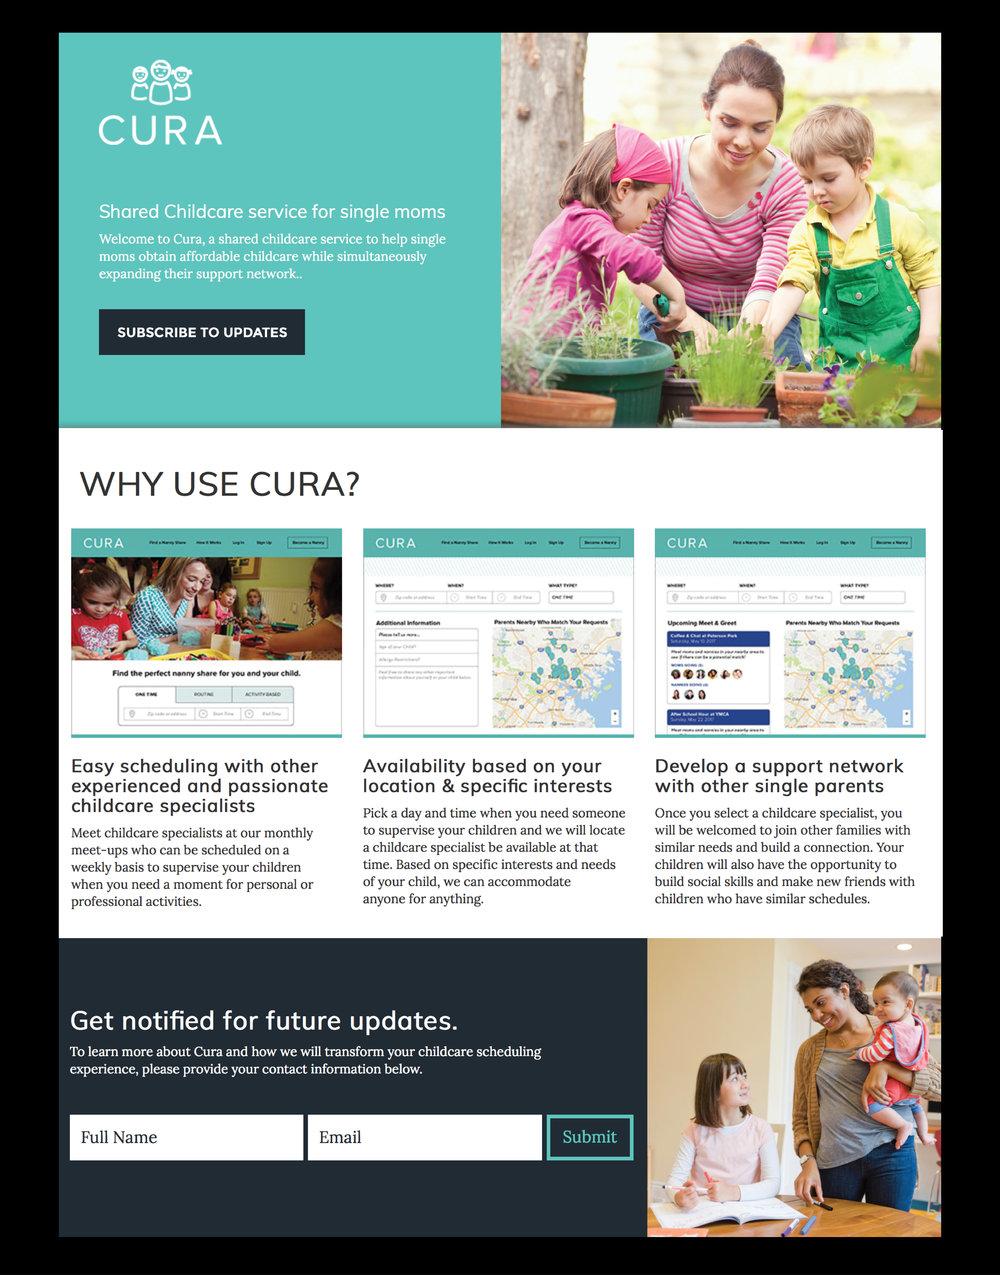 Cura_Launchrock.jpg